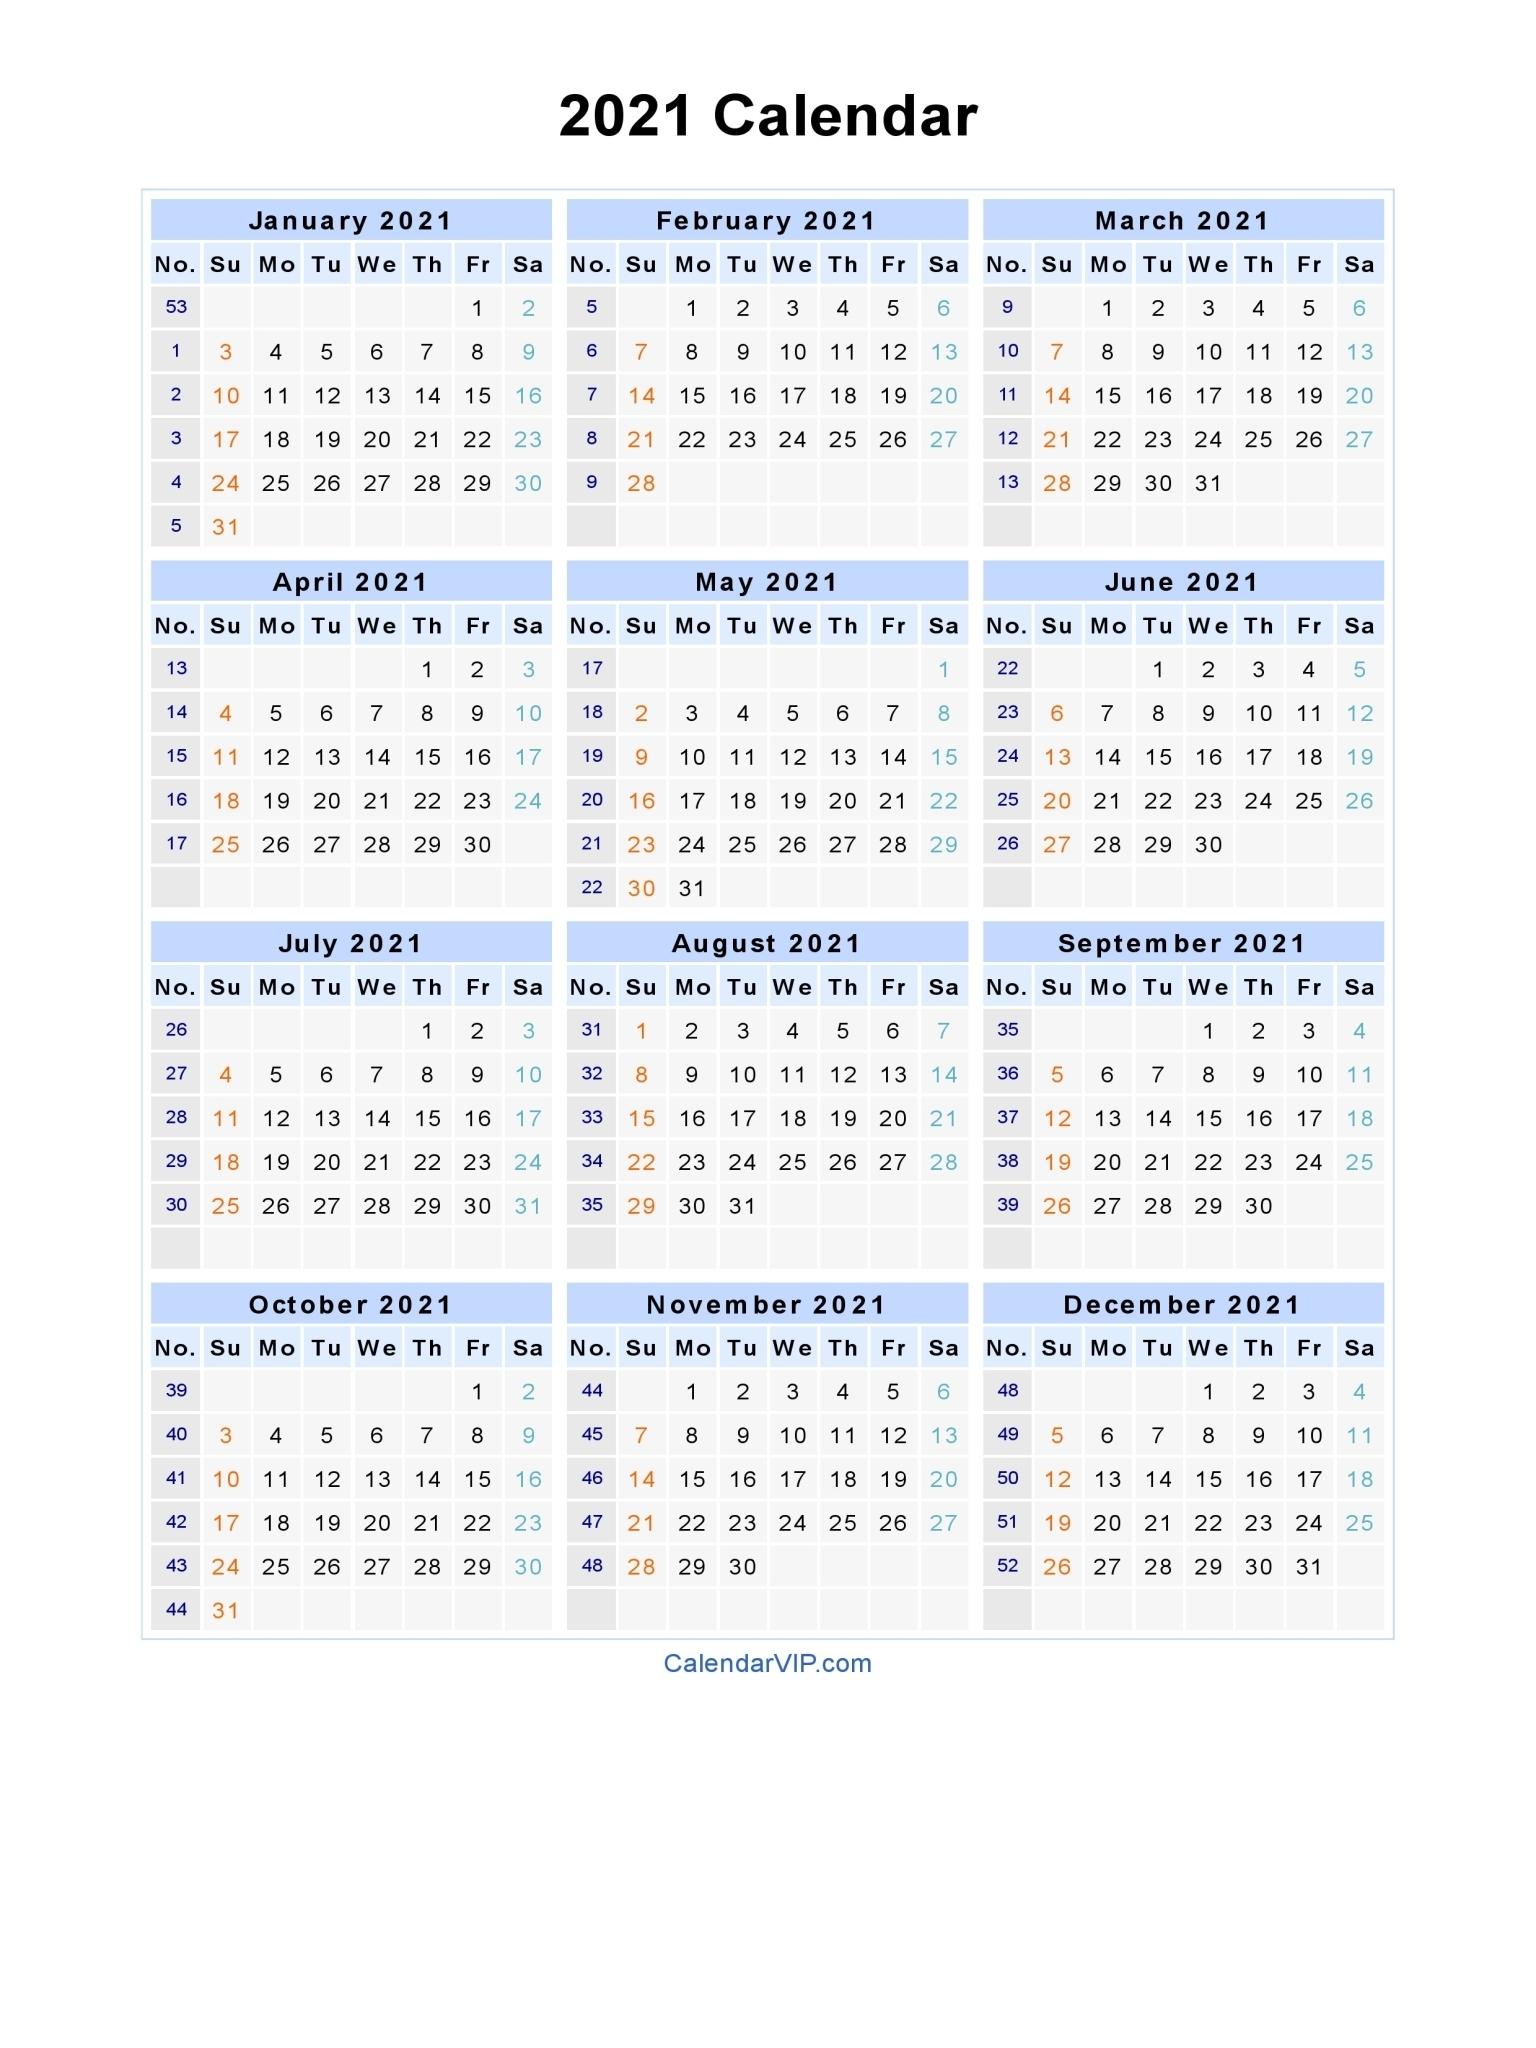 Free Printable Calendar Year 2021 | Ten Free Printable ...